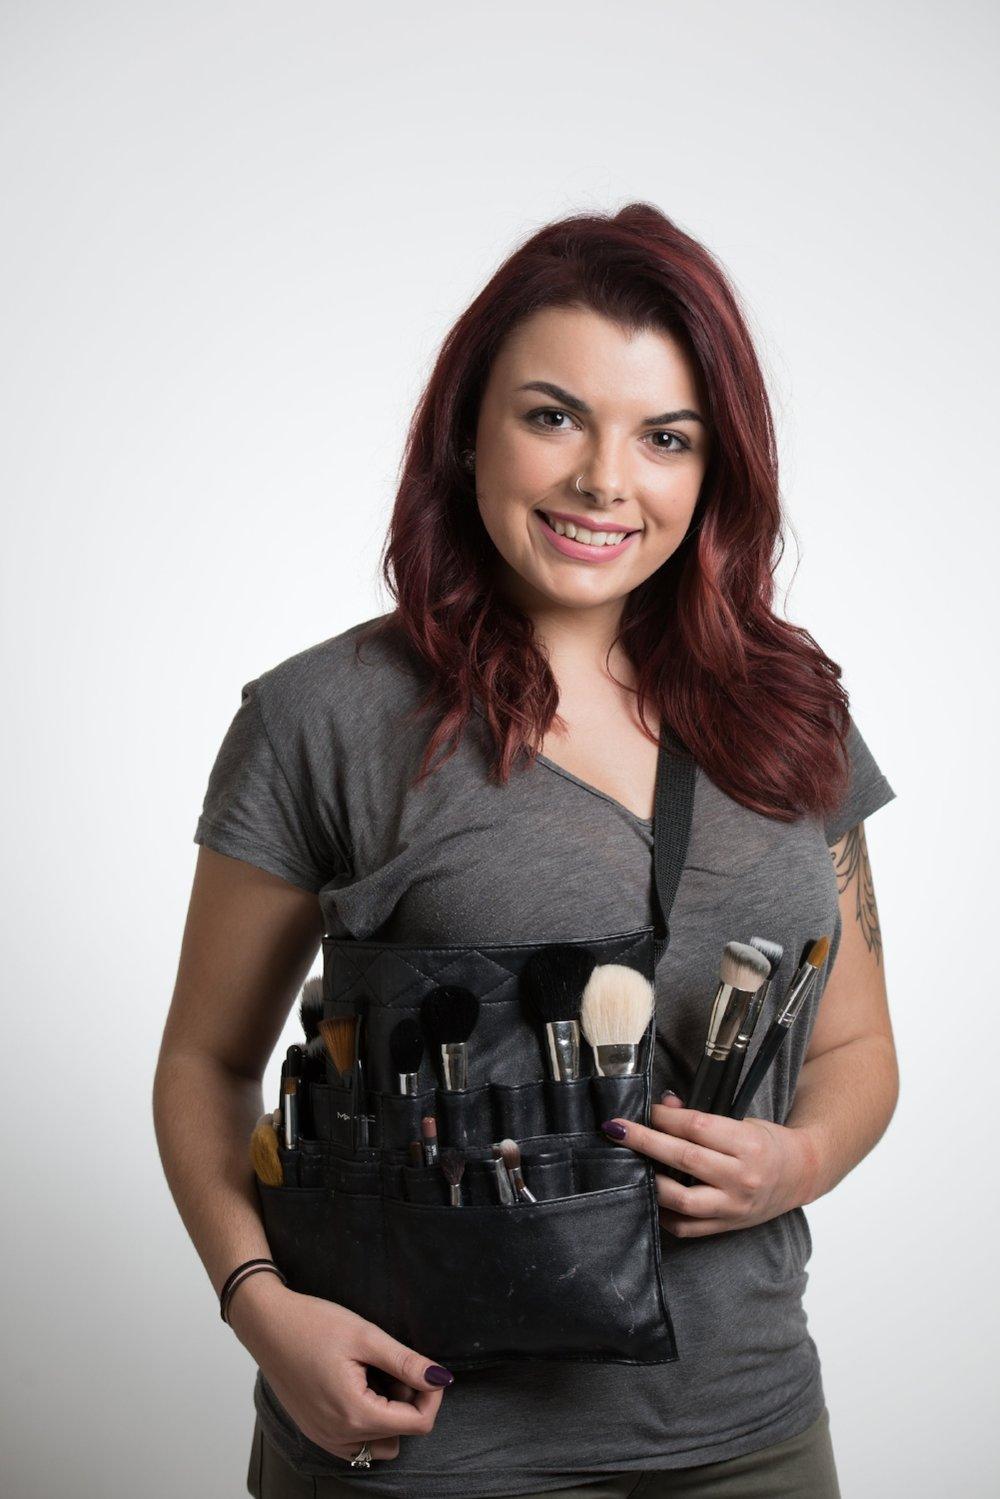 philadelphia-business-woman-personal-branding-photographer